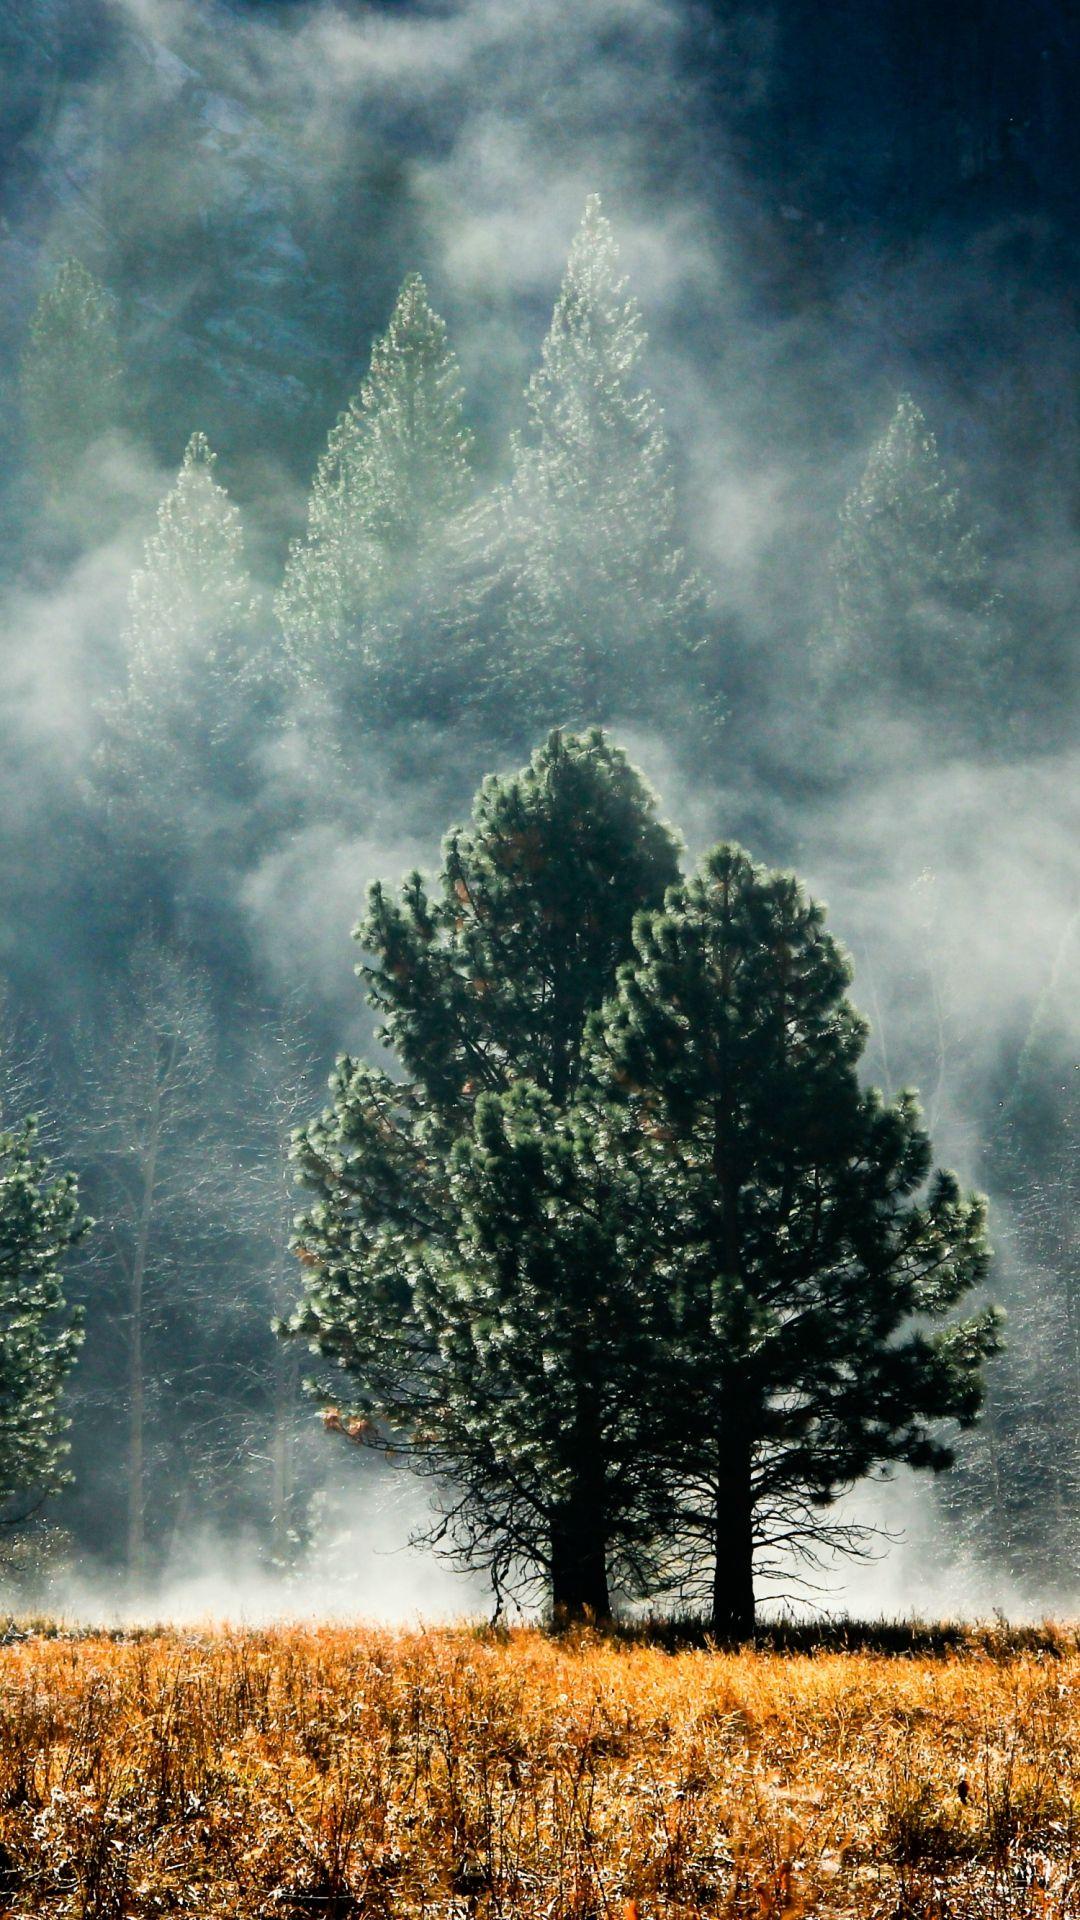 1080x1920 Wallpaper Fog Pines Grass Faded Colors Nature Iphone Wallpaper Hd Nature Wallpapers Nature Wallpaper